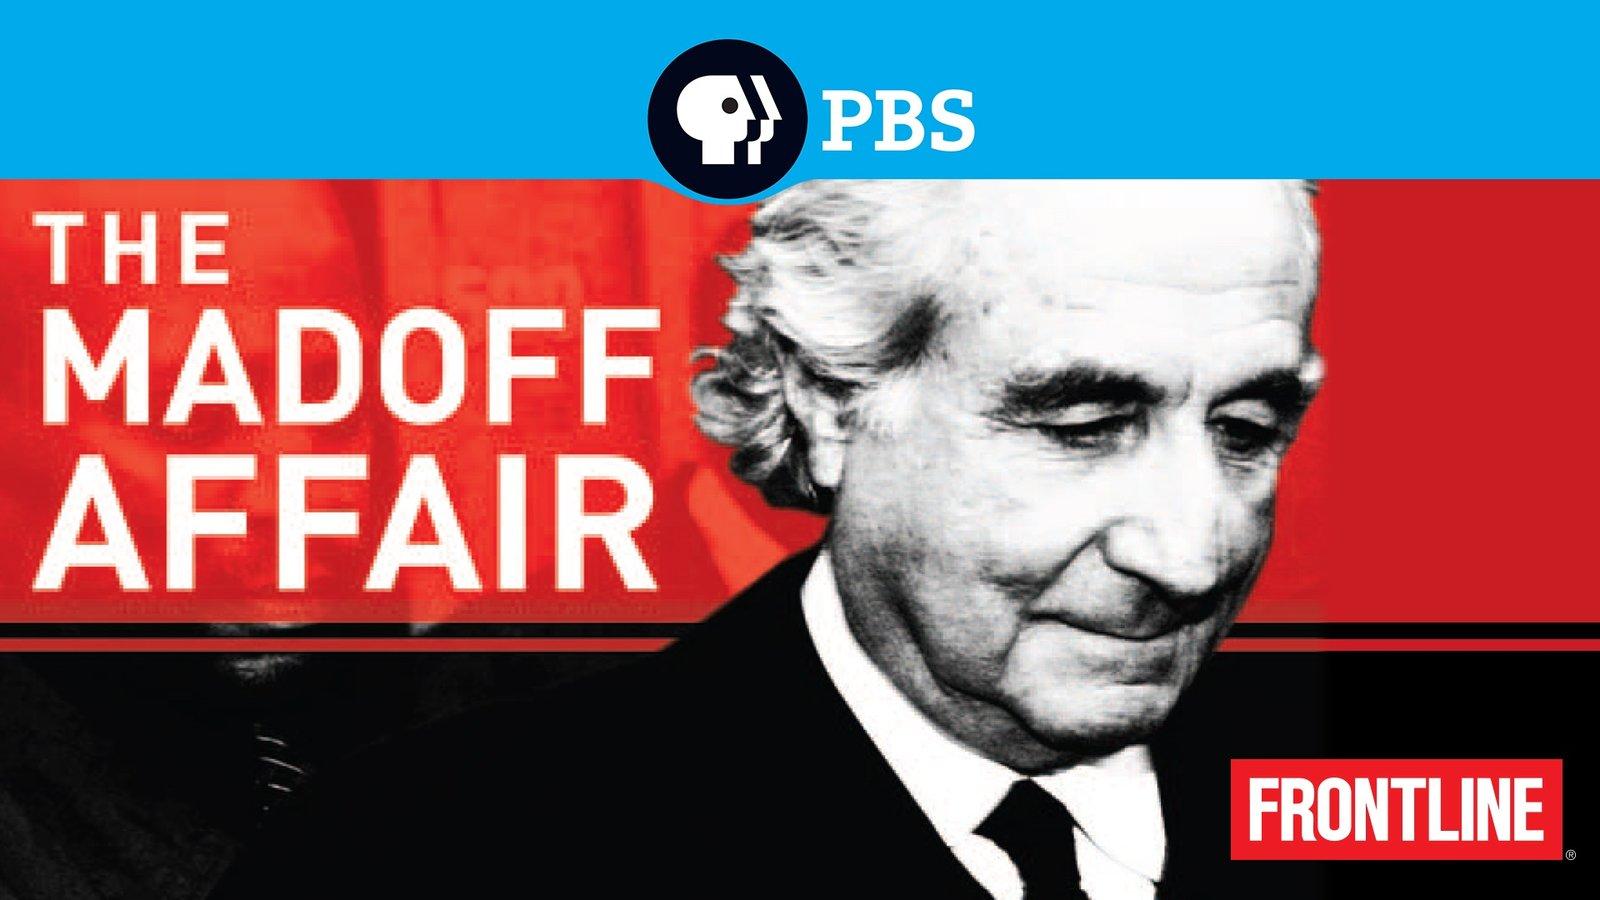 The Madoff Affair - The First Global Ponzi Scheme